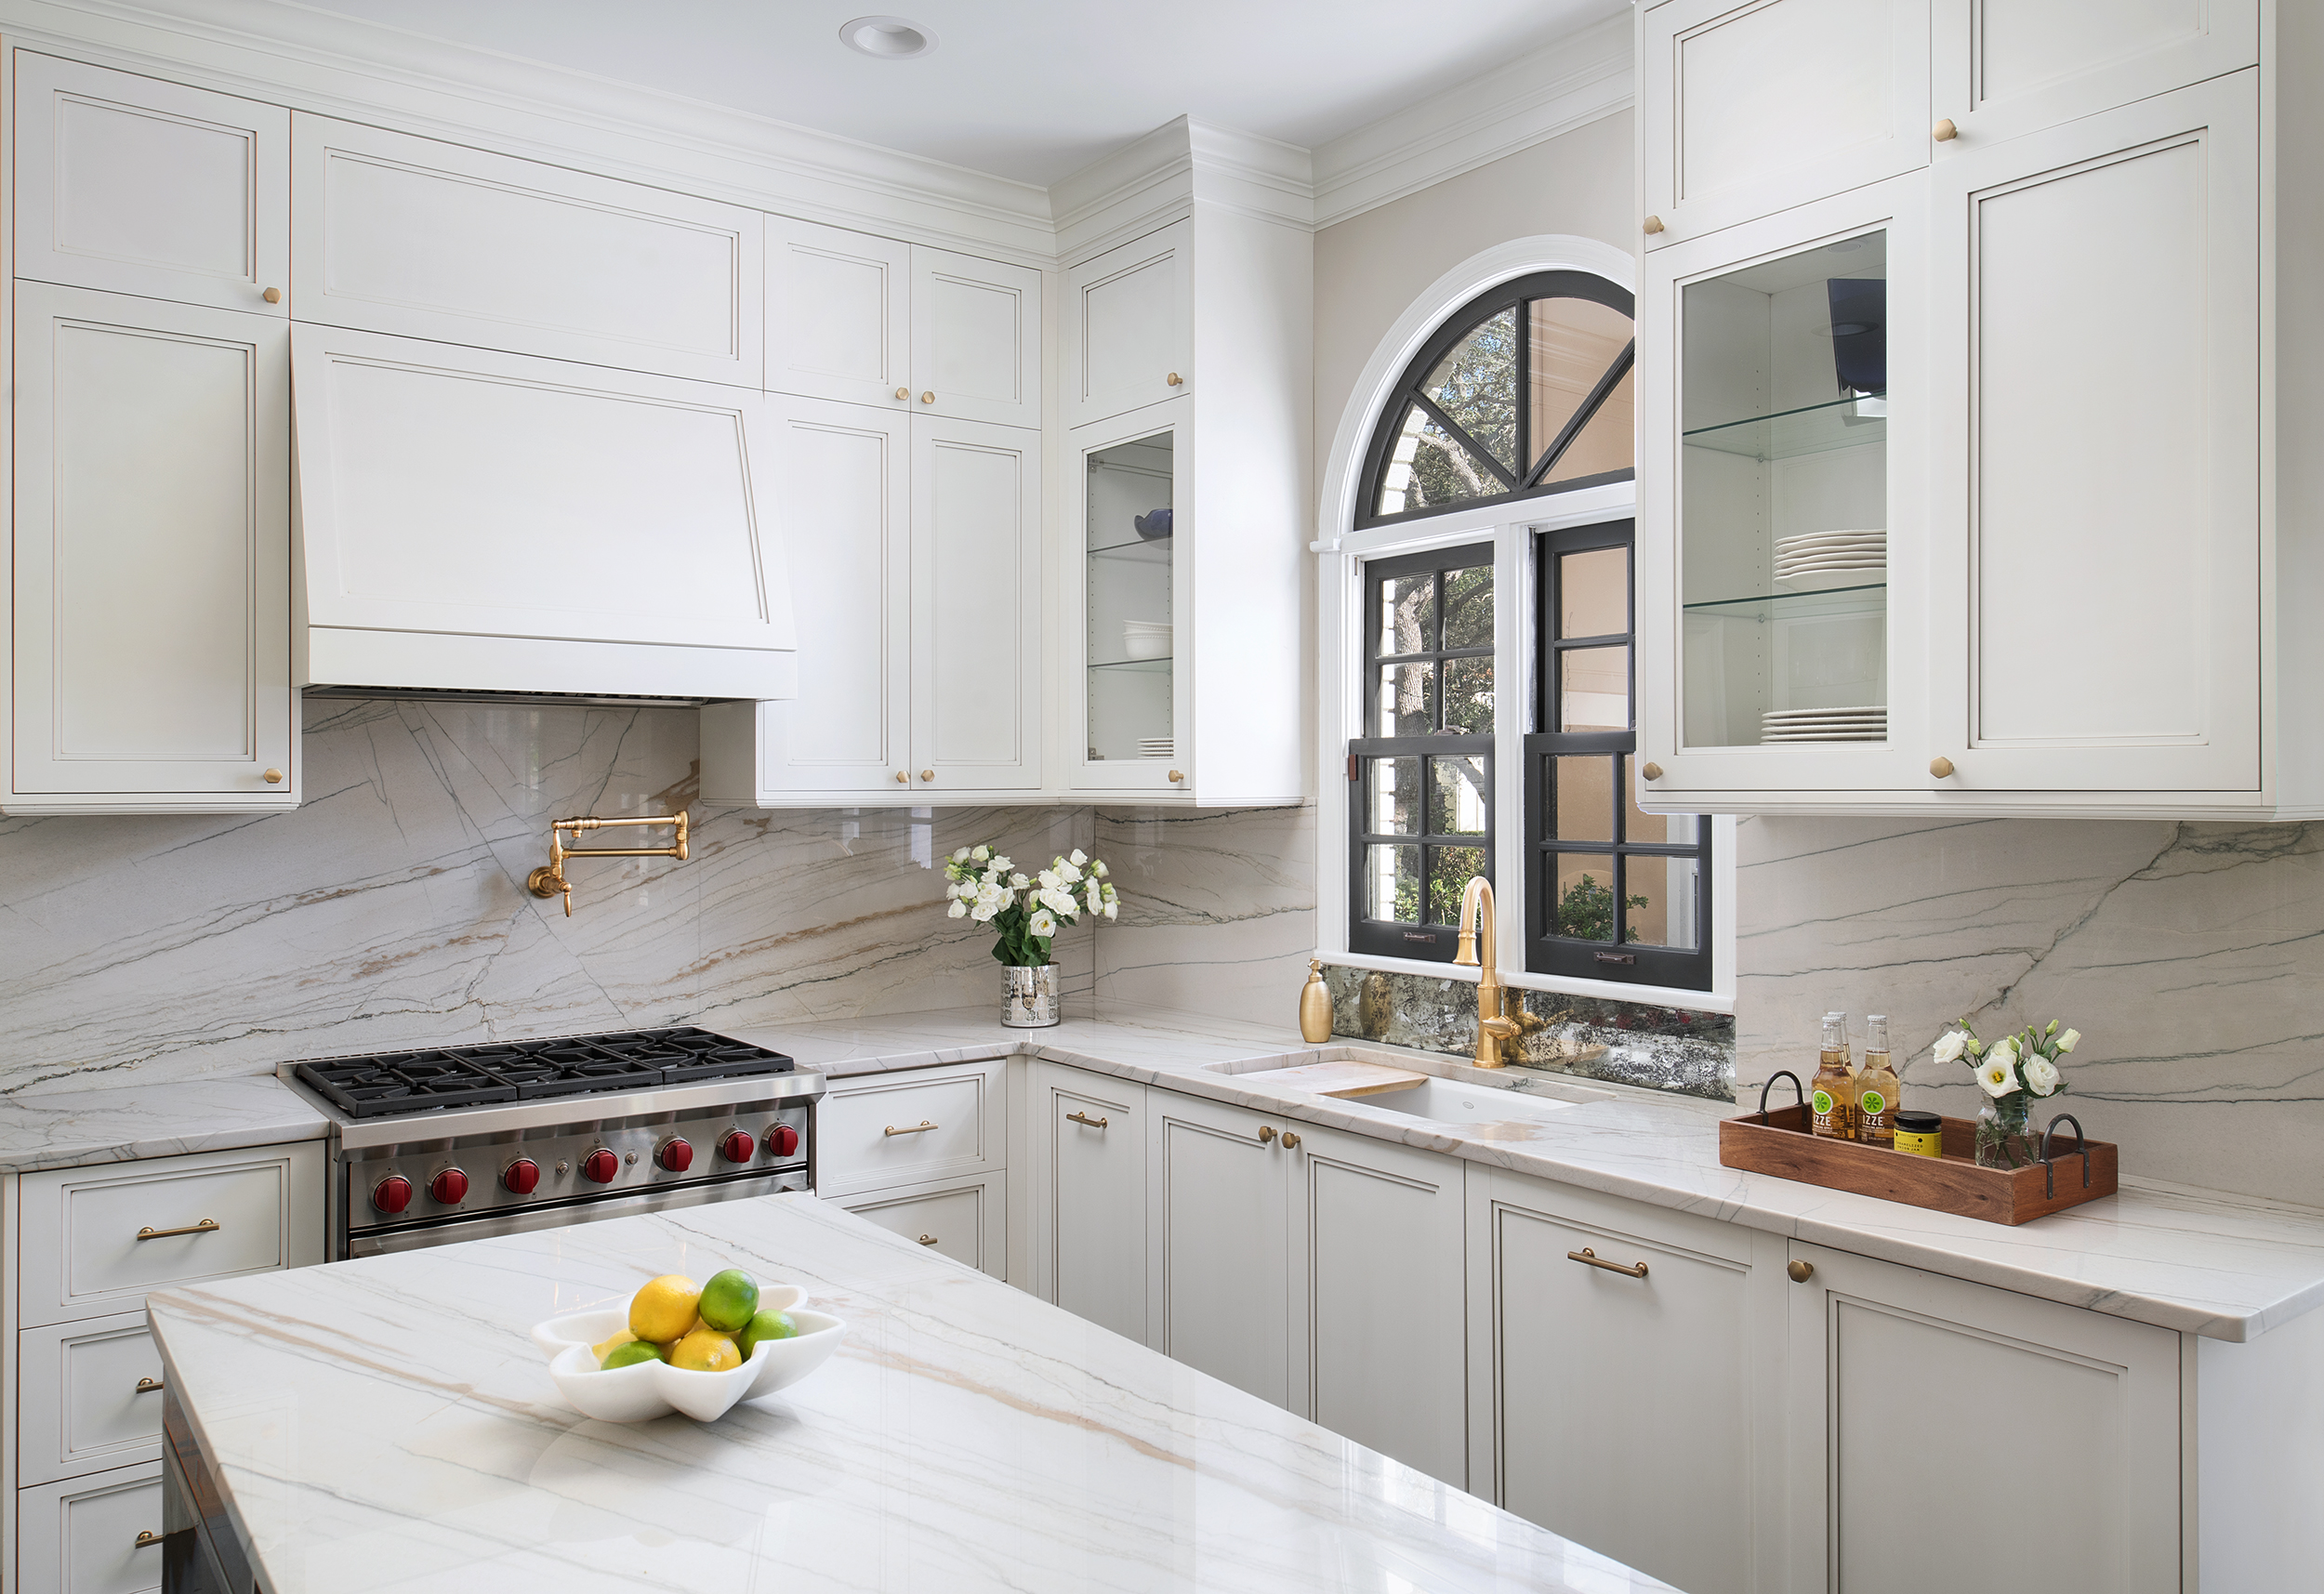 kylie-italiano---ellison-house---kitchen-angle.jpeg